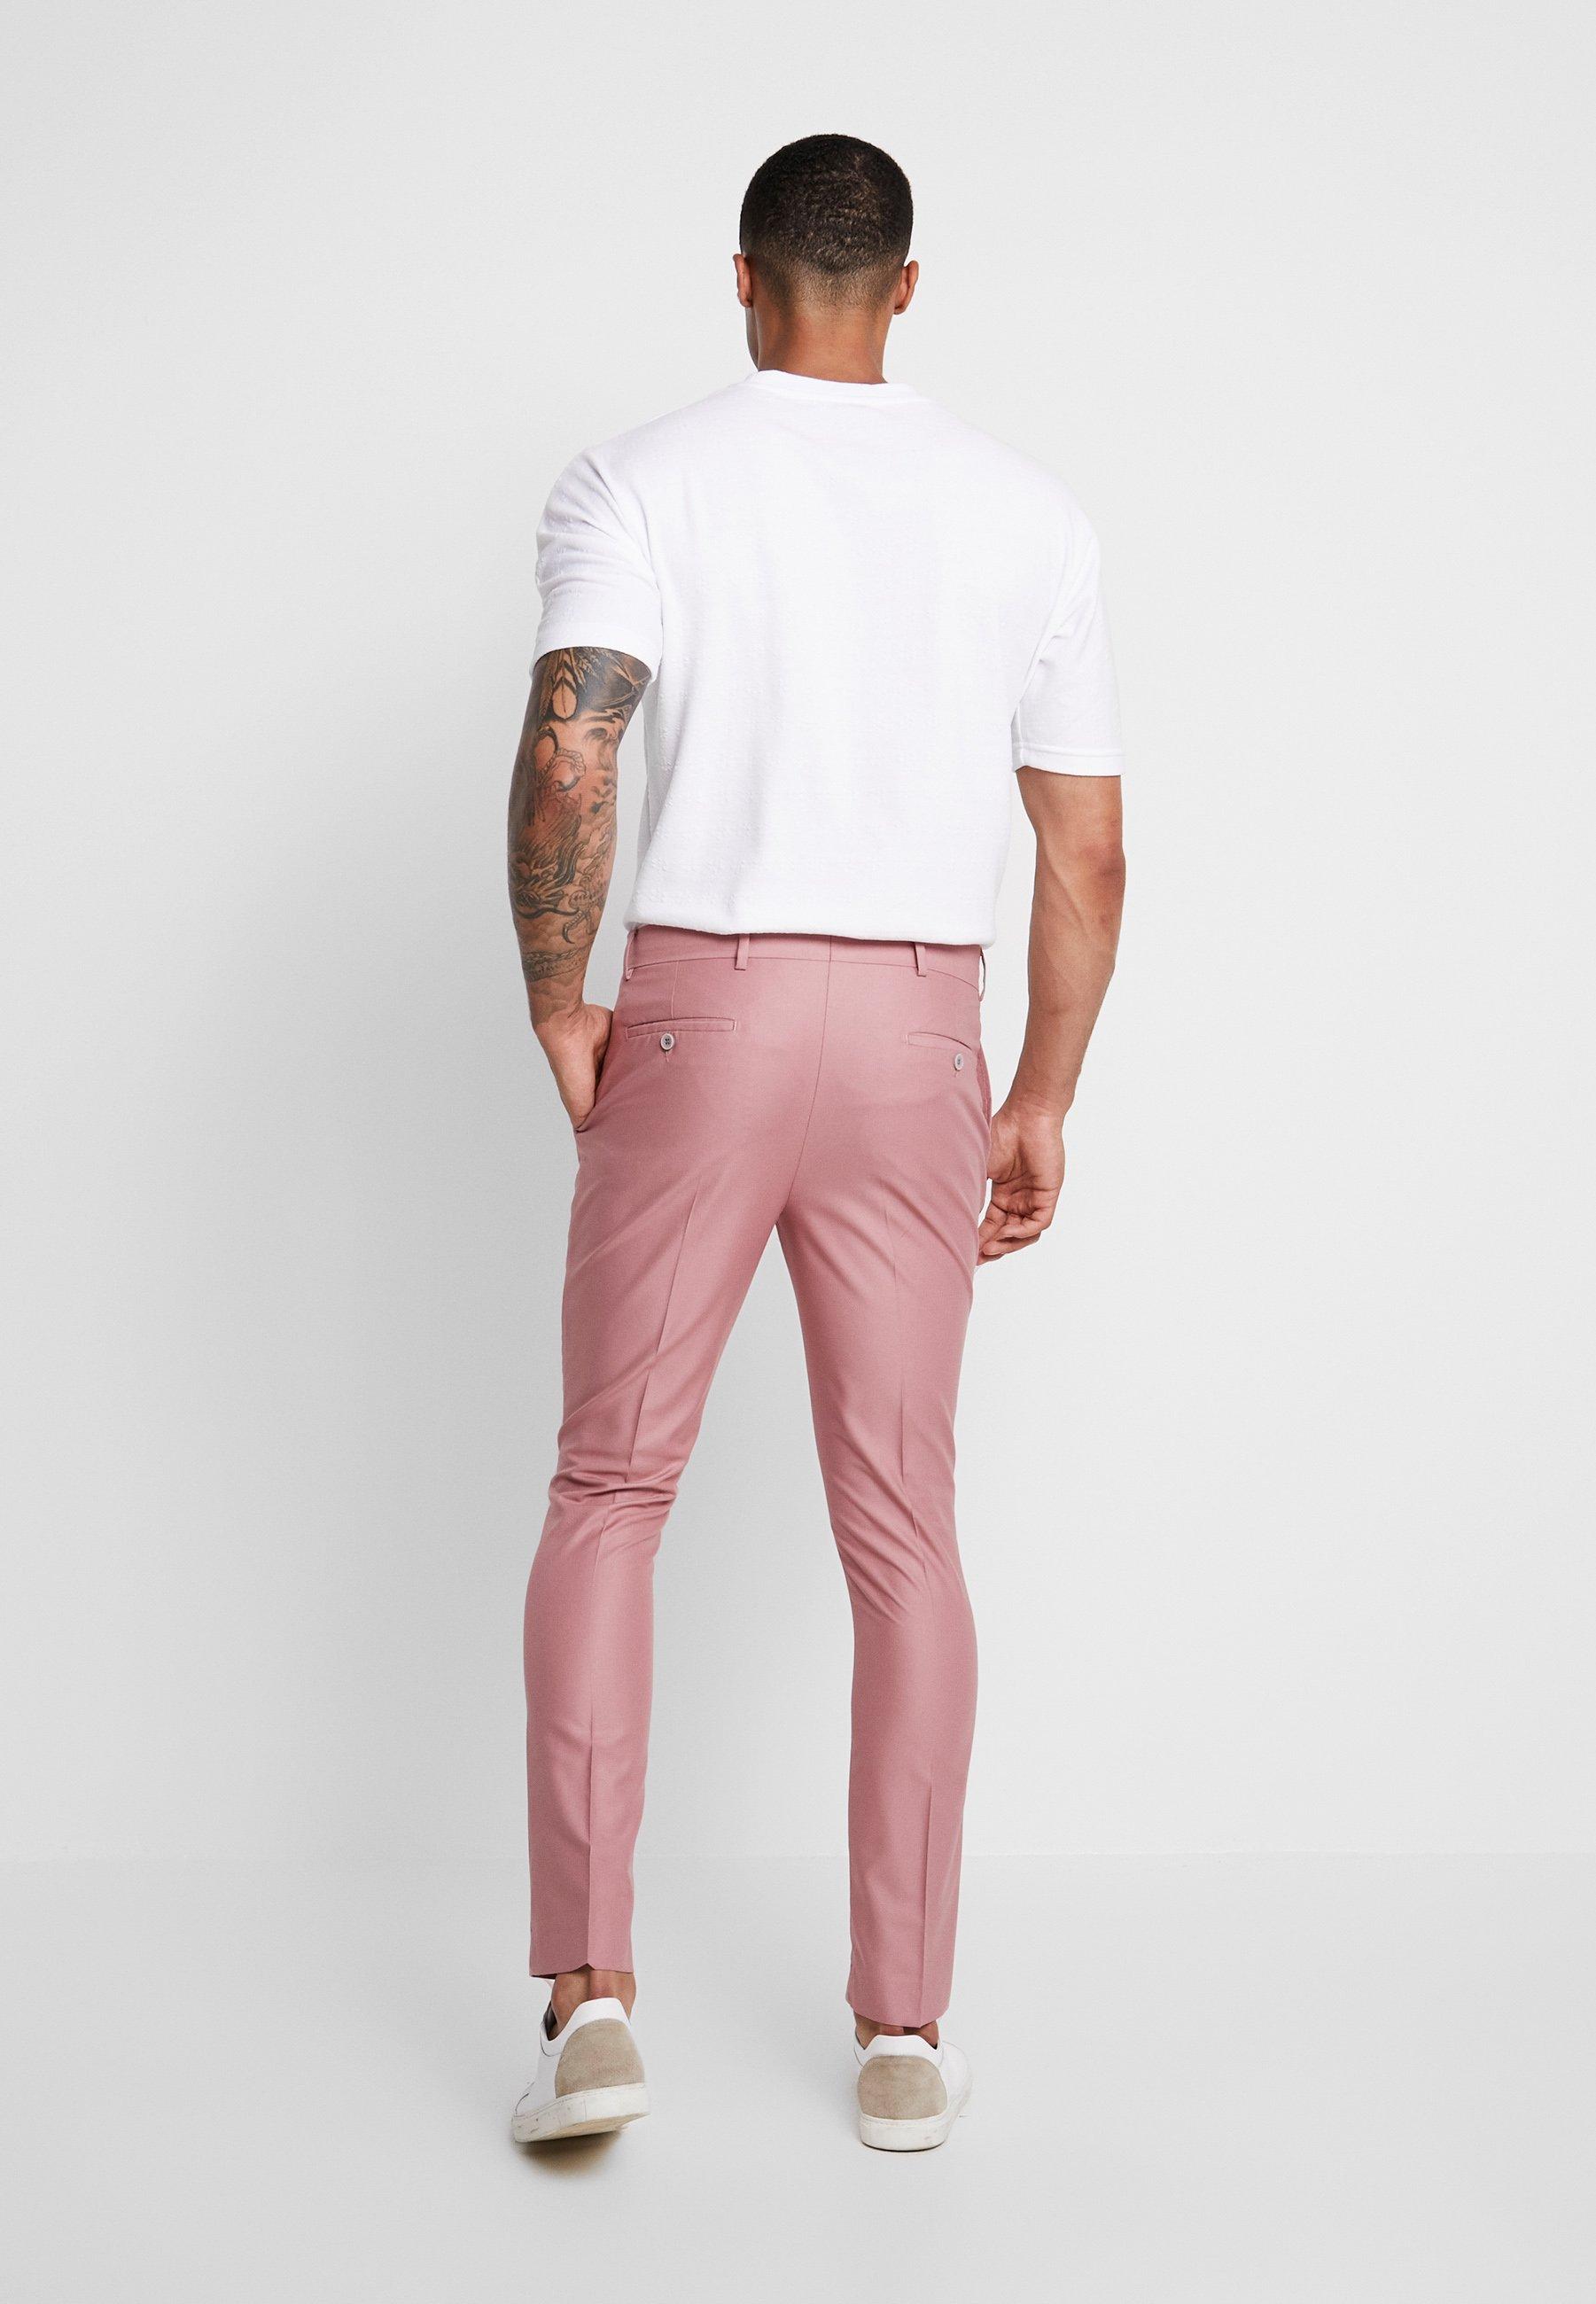 De Suit Boohoo Costume Man TrouserPantalon Pink I29WHYbEeD